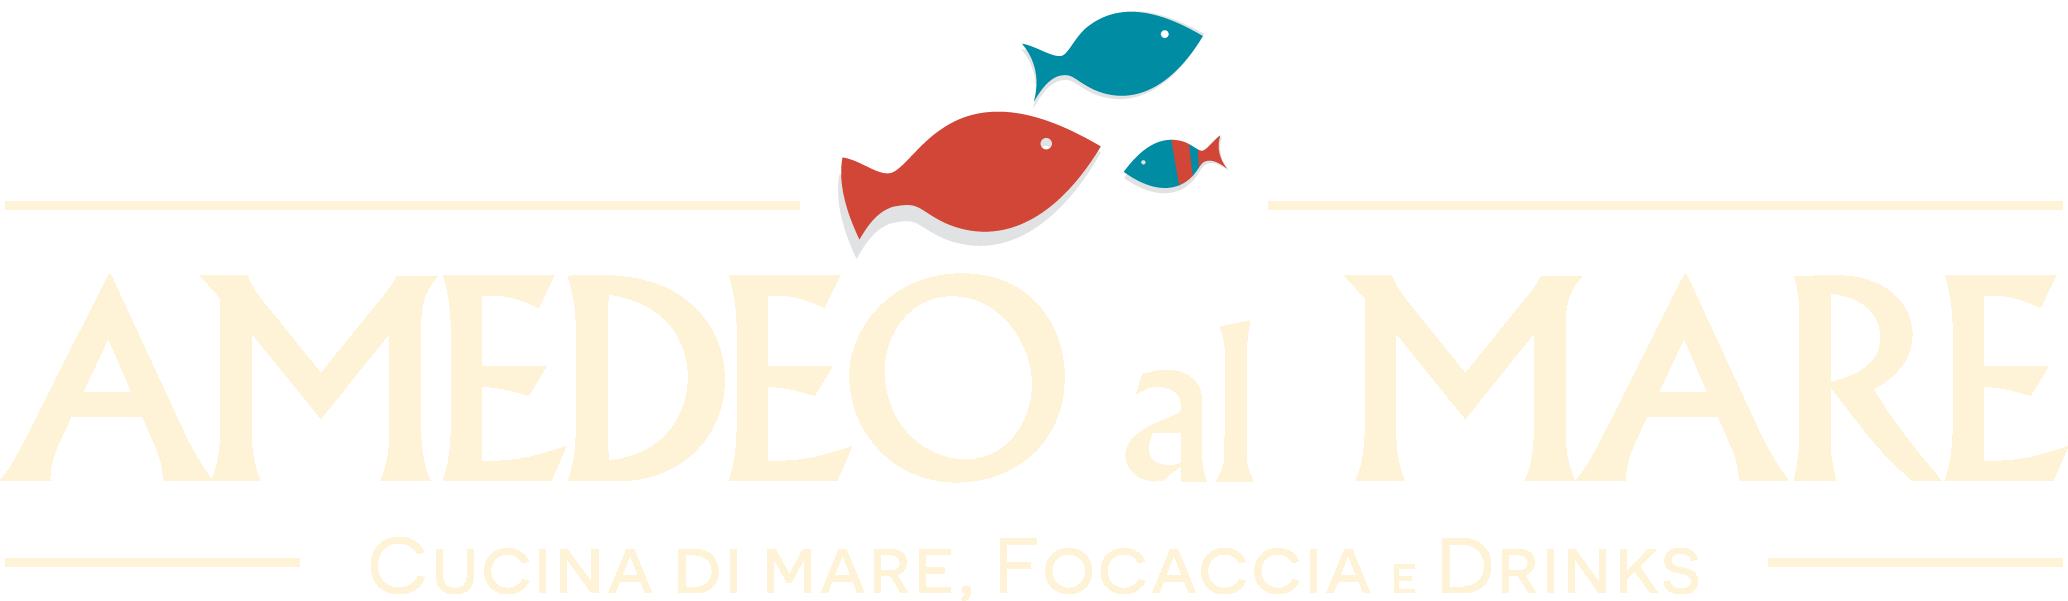 Amedeo al Mare logo